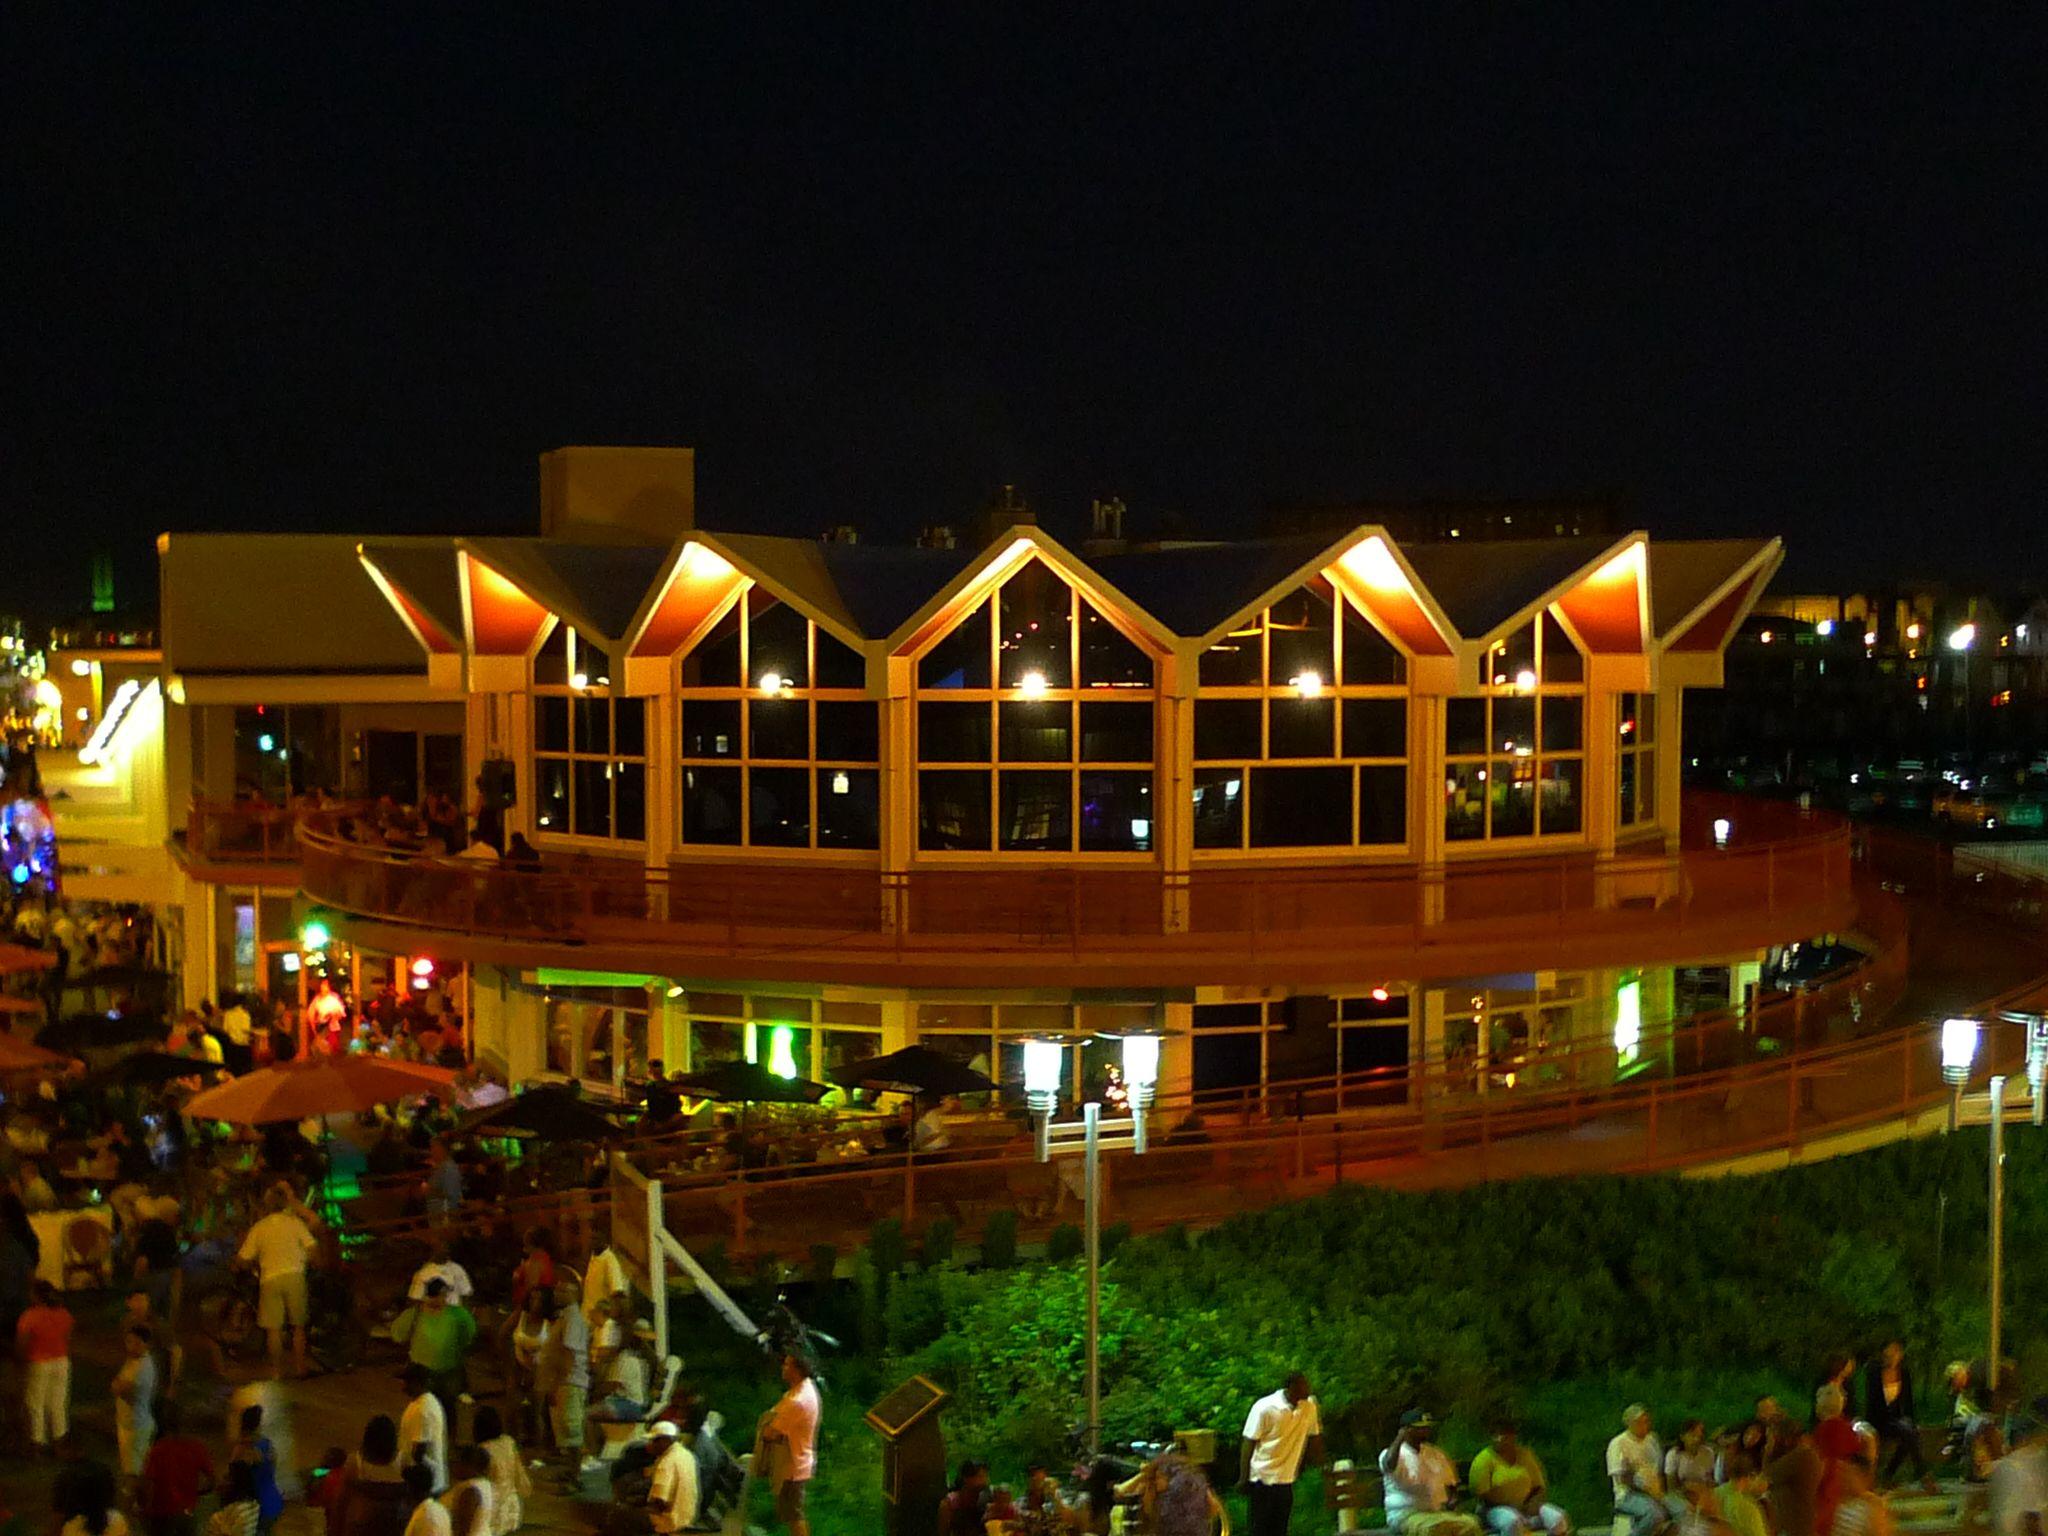 wedding venues asbury park nj%0A Tim McLoone u    s Supper Club on the Asbury Park Boardwalk